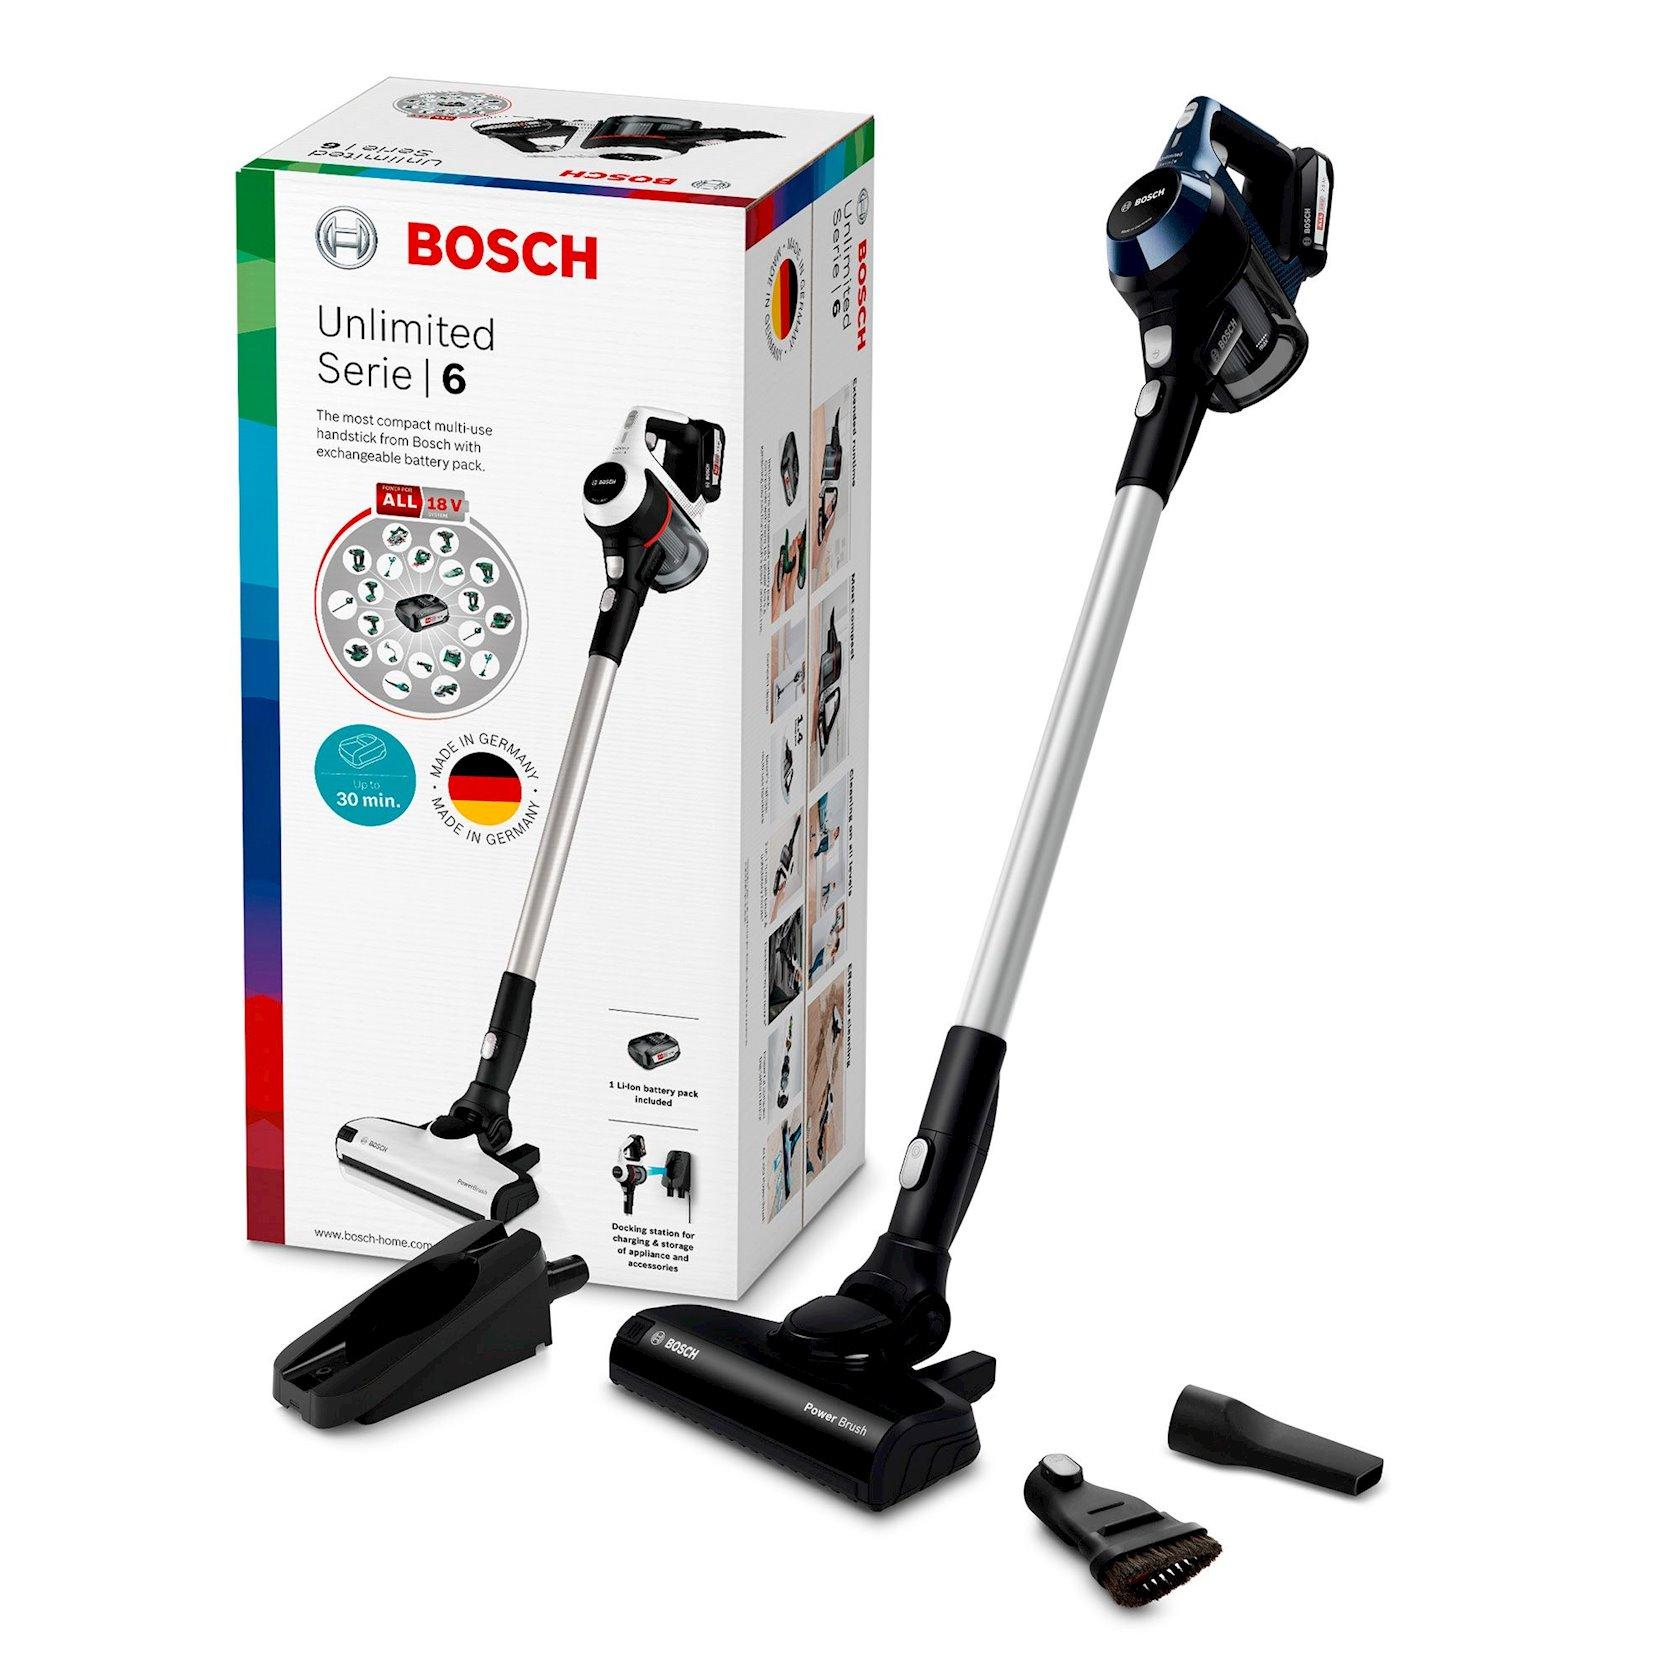 Vertikal akkumulyator tozsoranı Bosch BBS611PCK